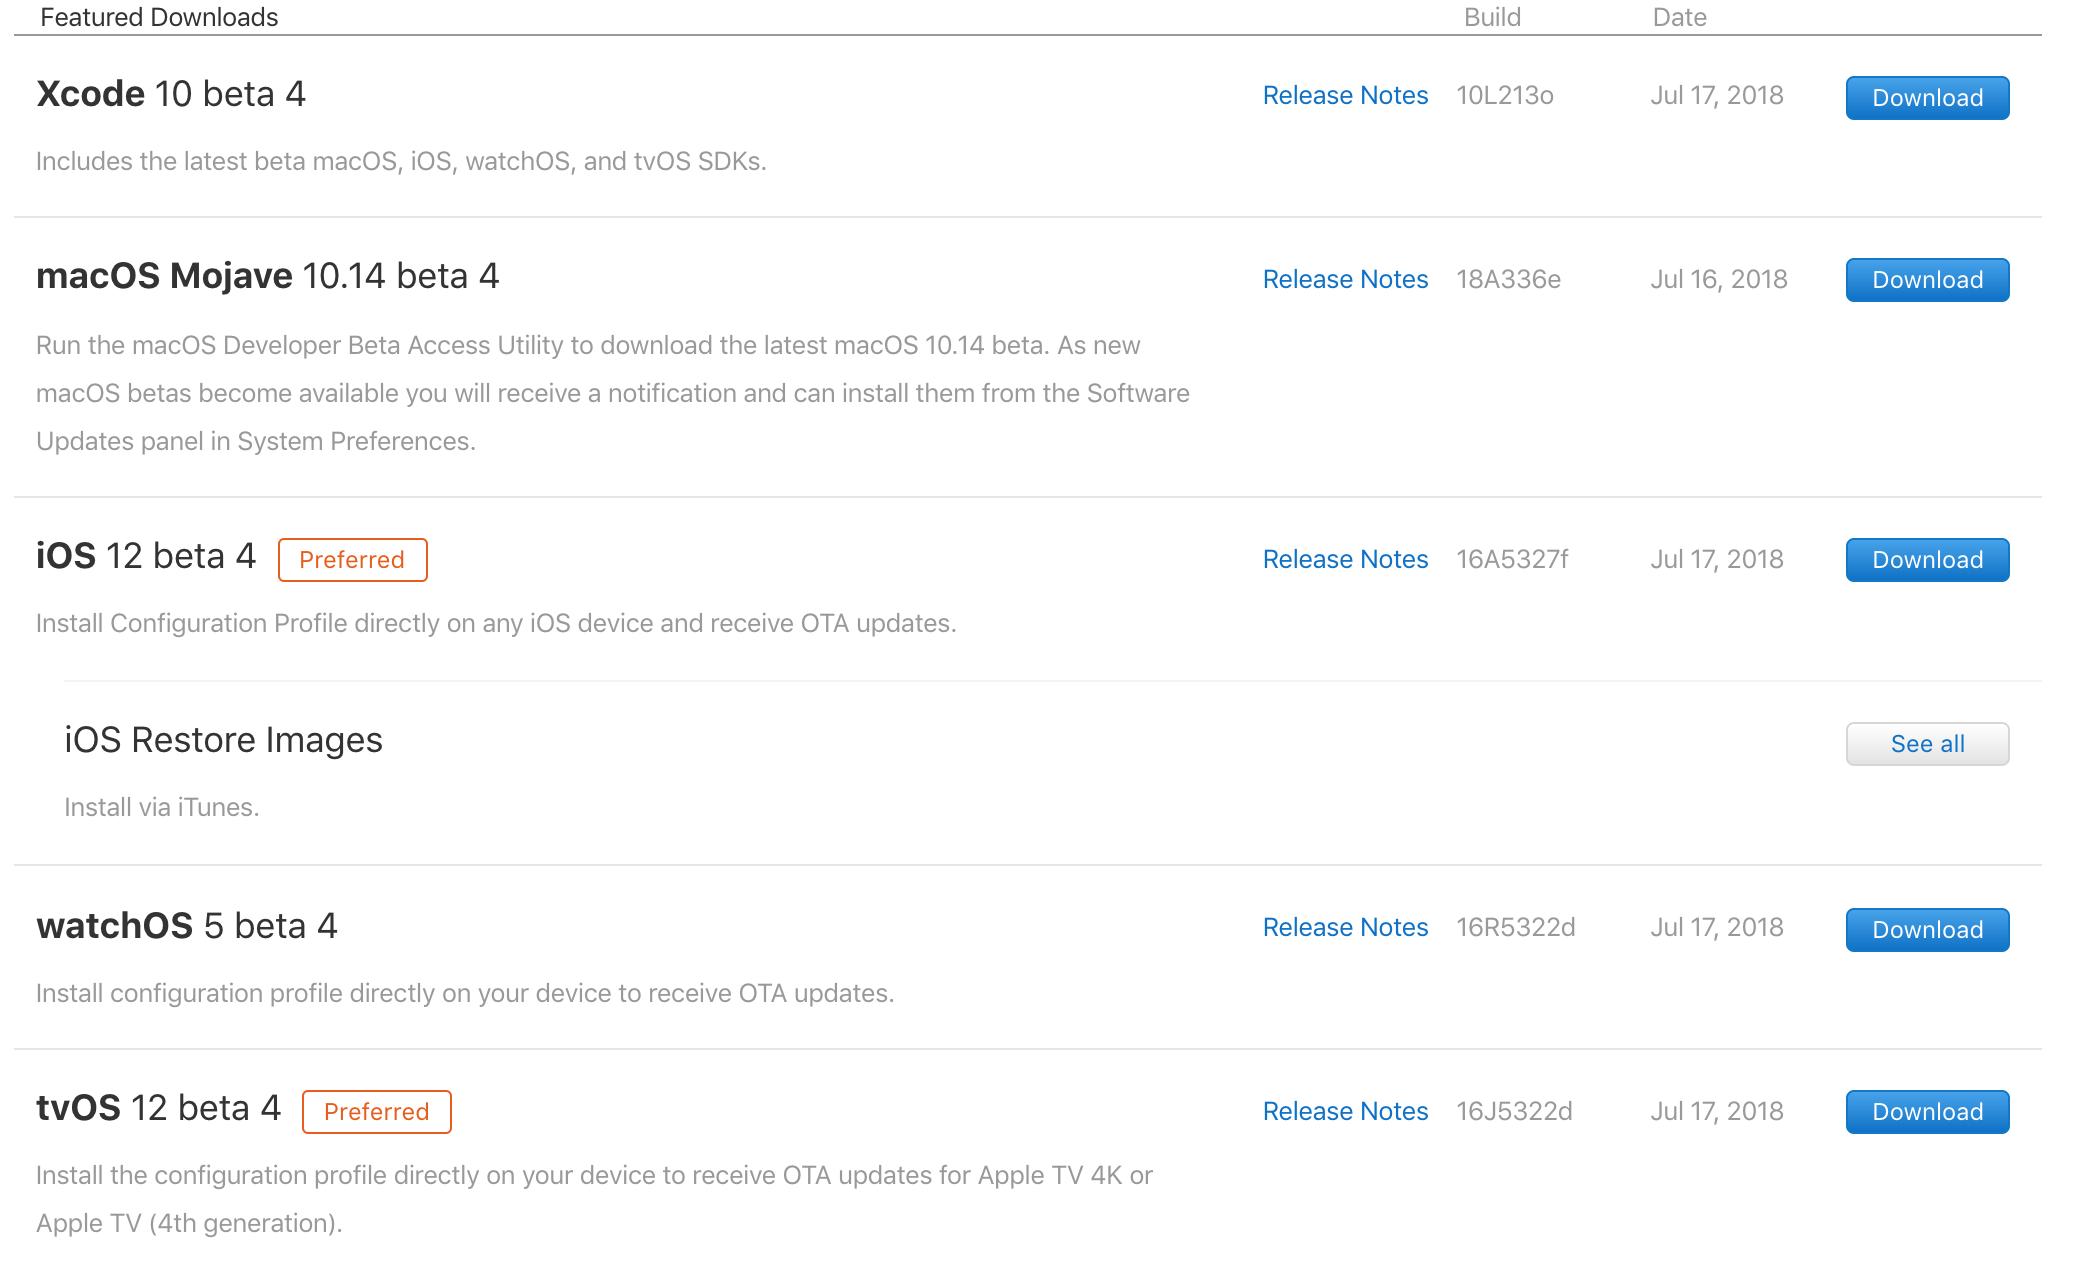 关于如何安装最新版-iOS 12 beta 4、Xcode 10 beta 4、macOS Mojave 10.14 beta 4、watchOS 5 beta 4、tvOS 12 beta 4 的方法!